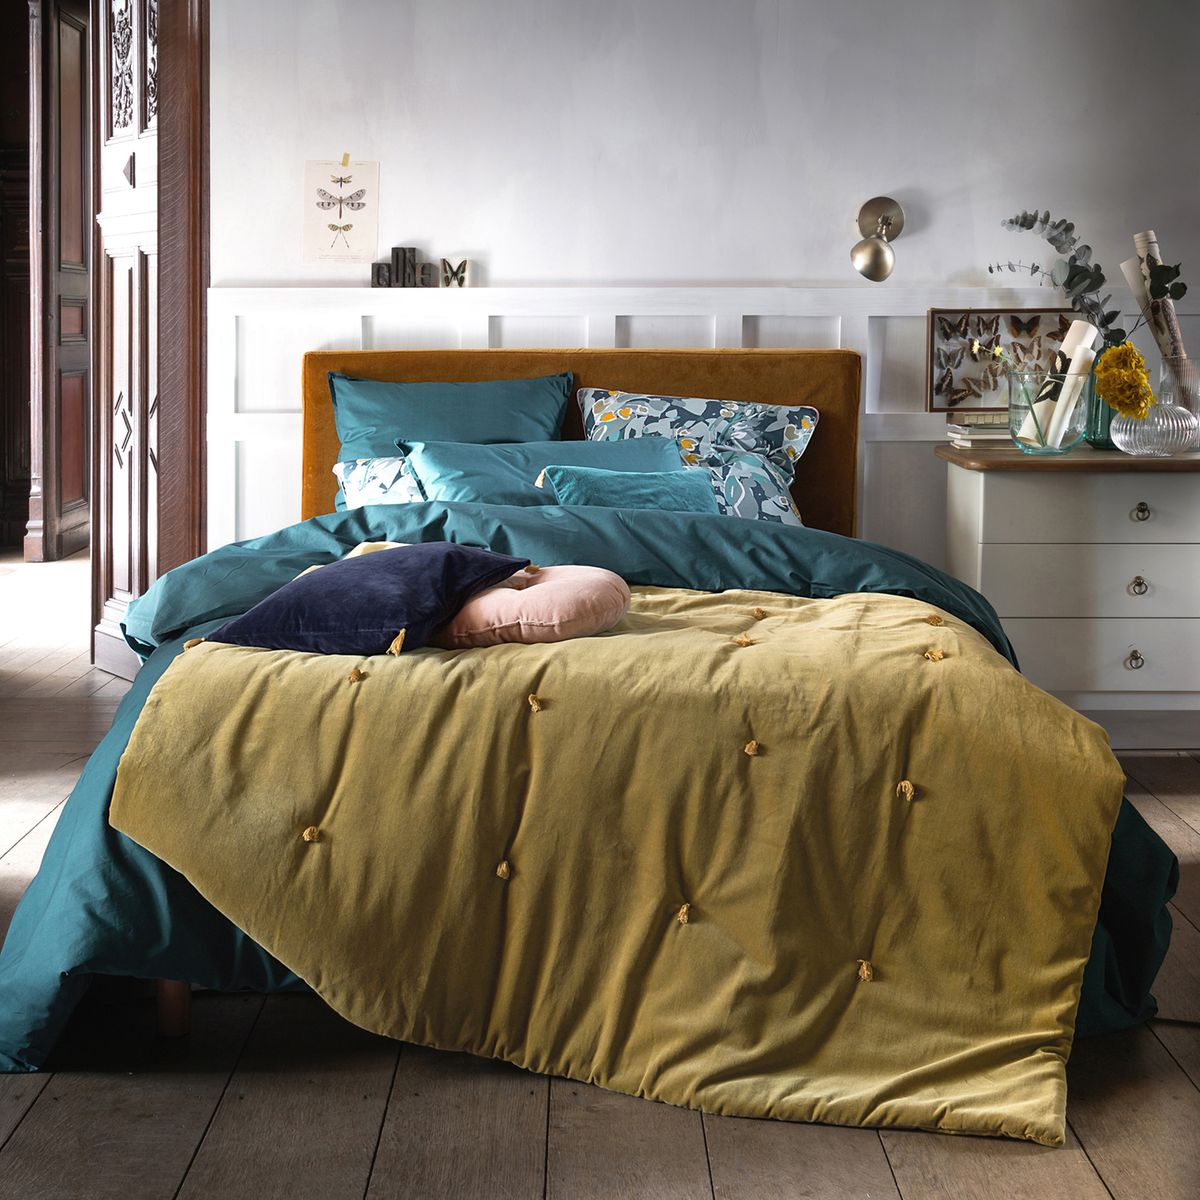 chambre bleu canard jaune moutarde velours drap édredon